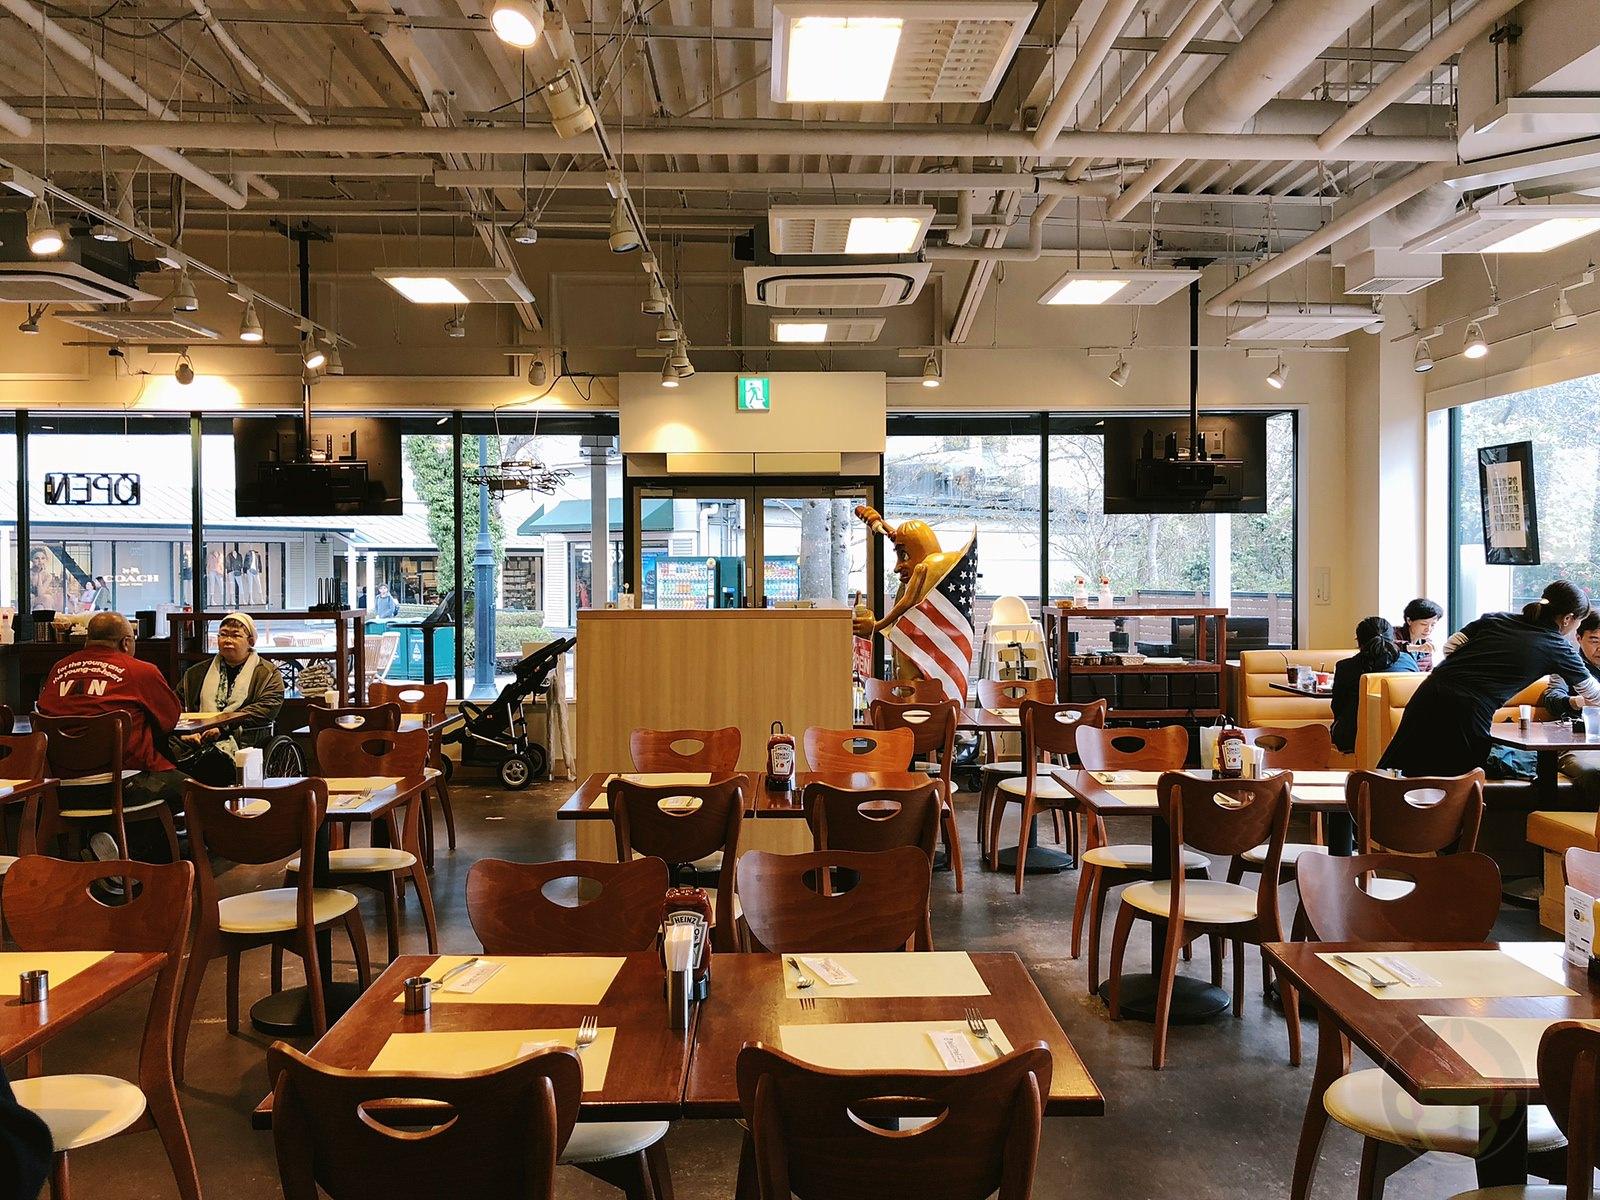 West-Park-Cafe-Gotenba-Outlet-Store-05.jpg